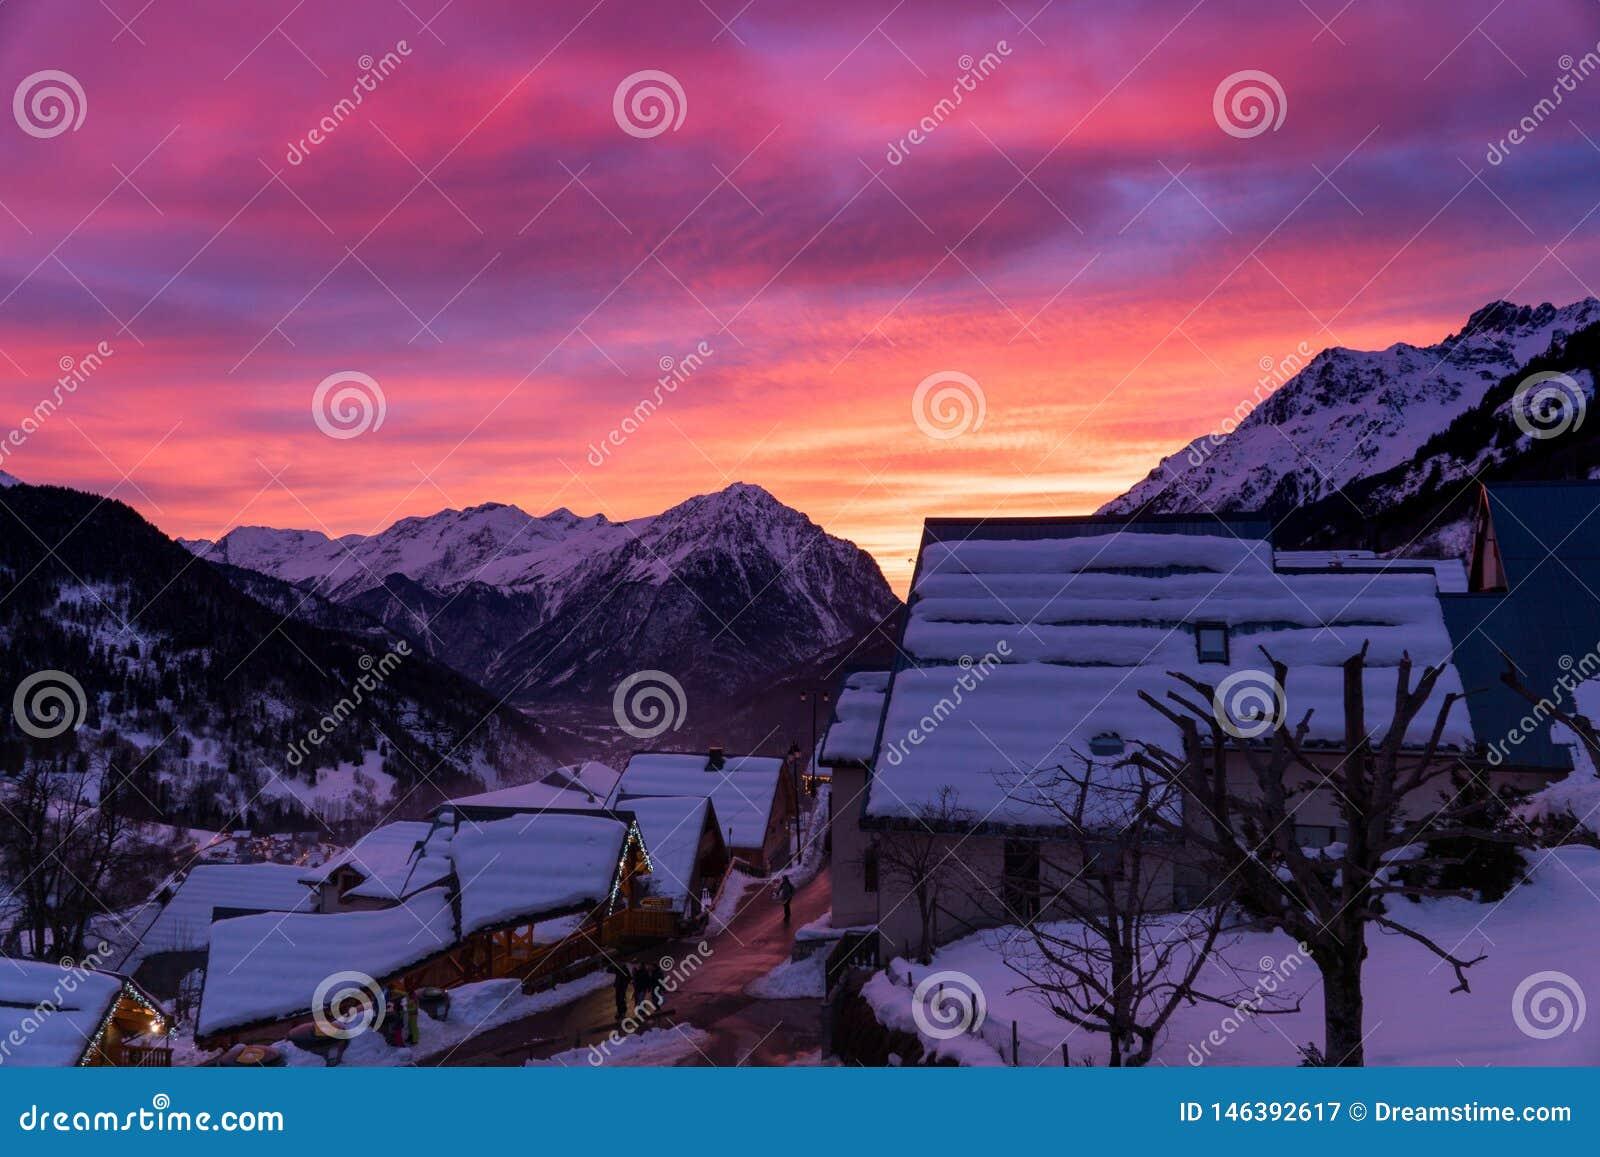 Bedöva solnedgång i fransk bergby